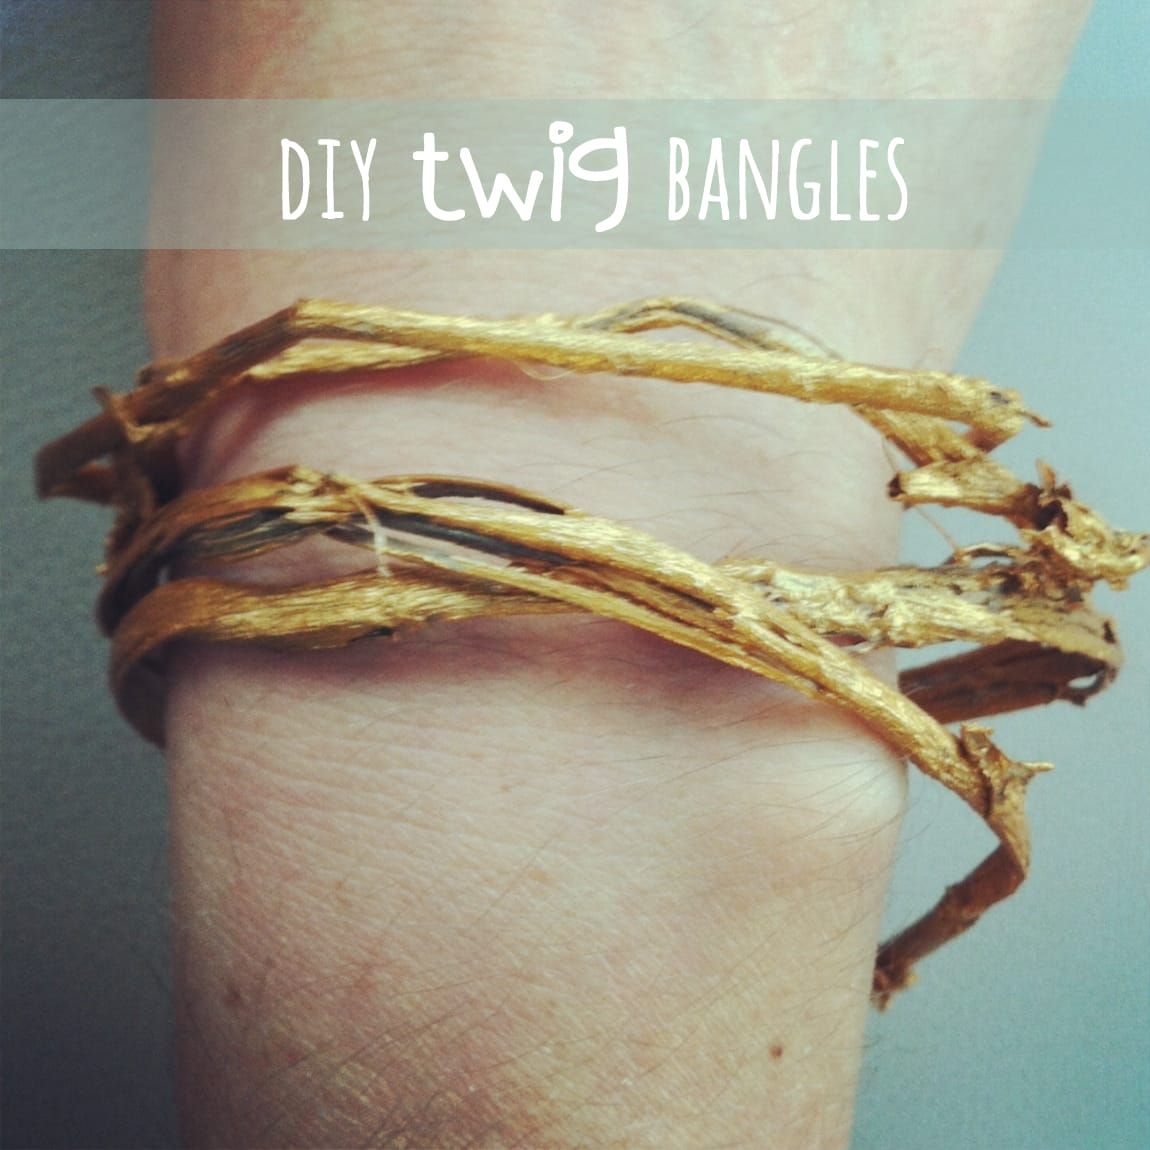 twig bangles